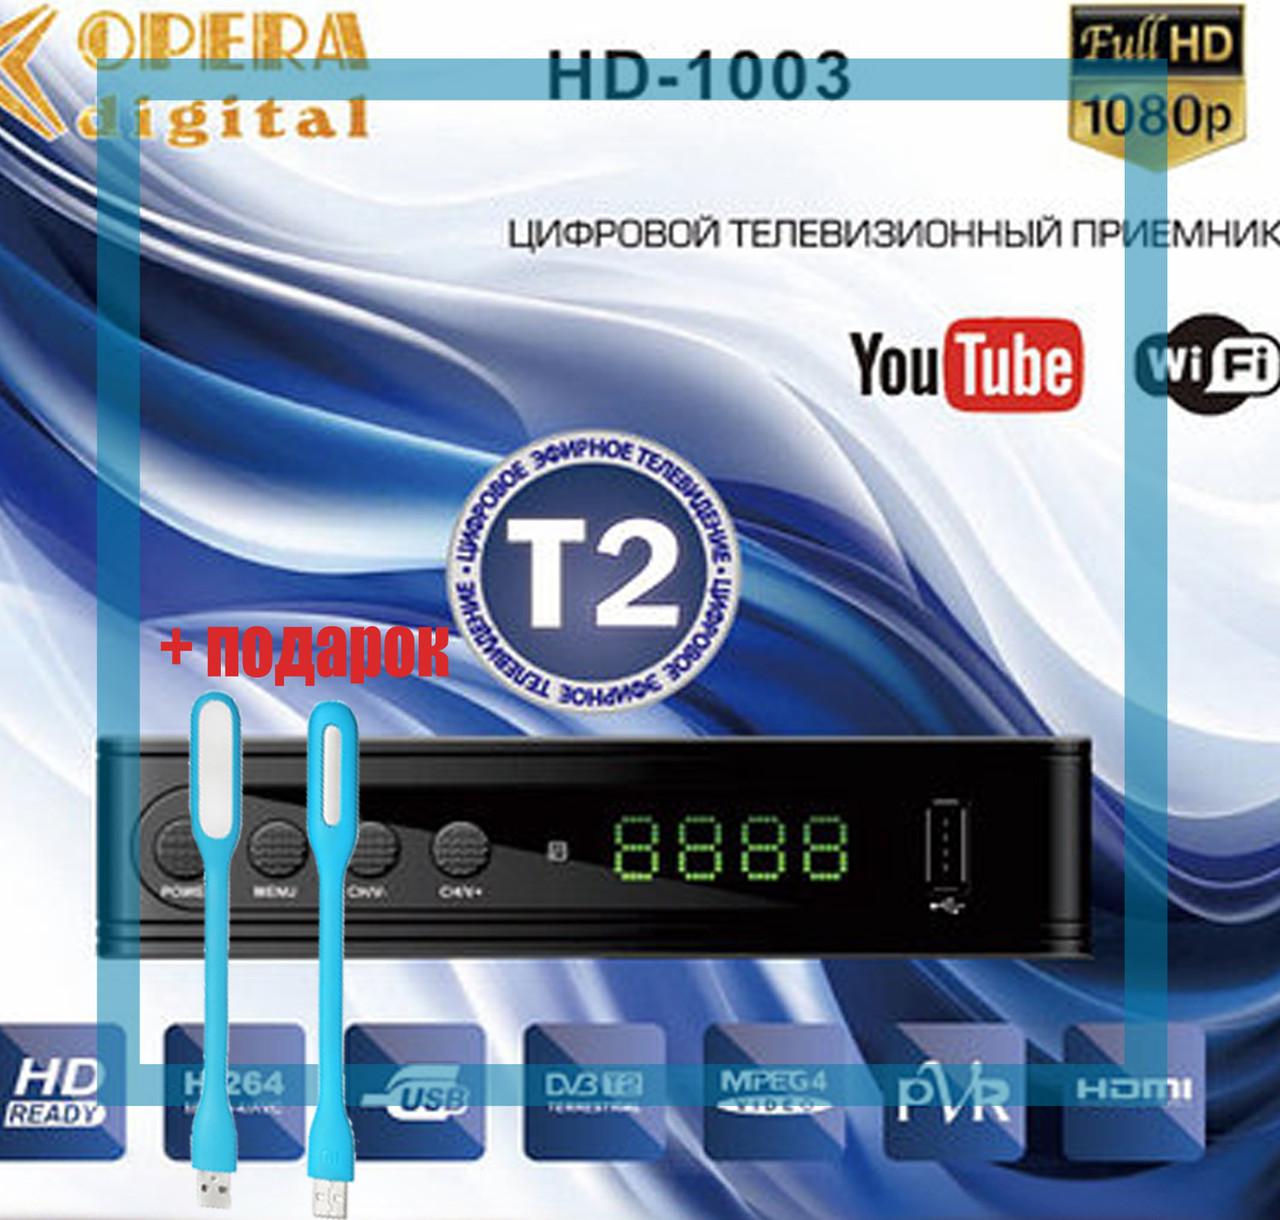 Тюнер Т2 приставка ТВ Пульт WiFi YouTube FullHD 32 канала IPTV простая настройка